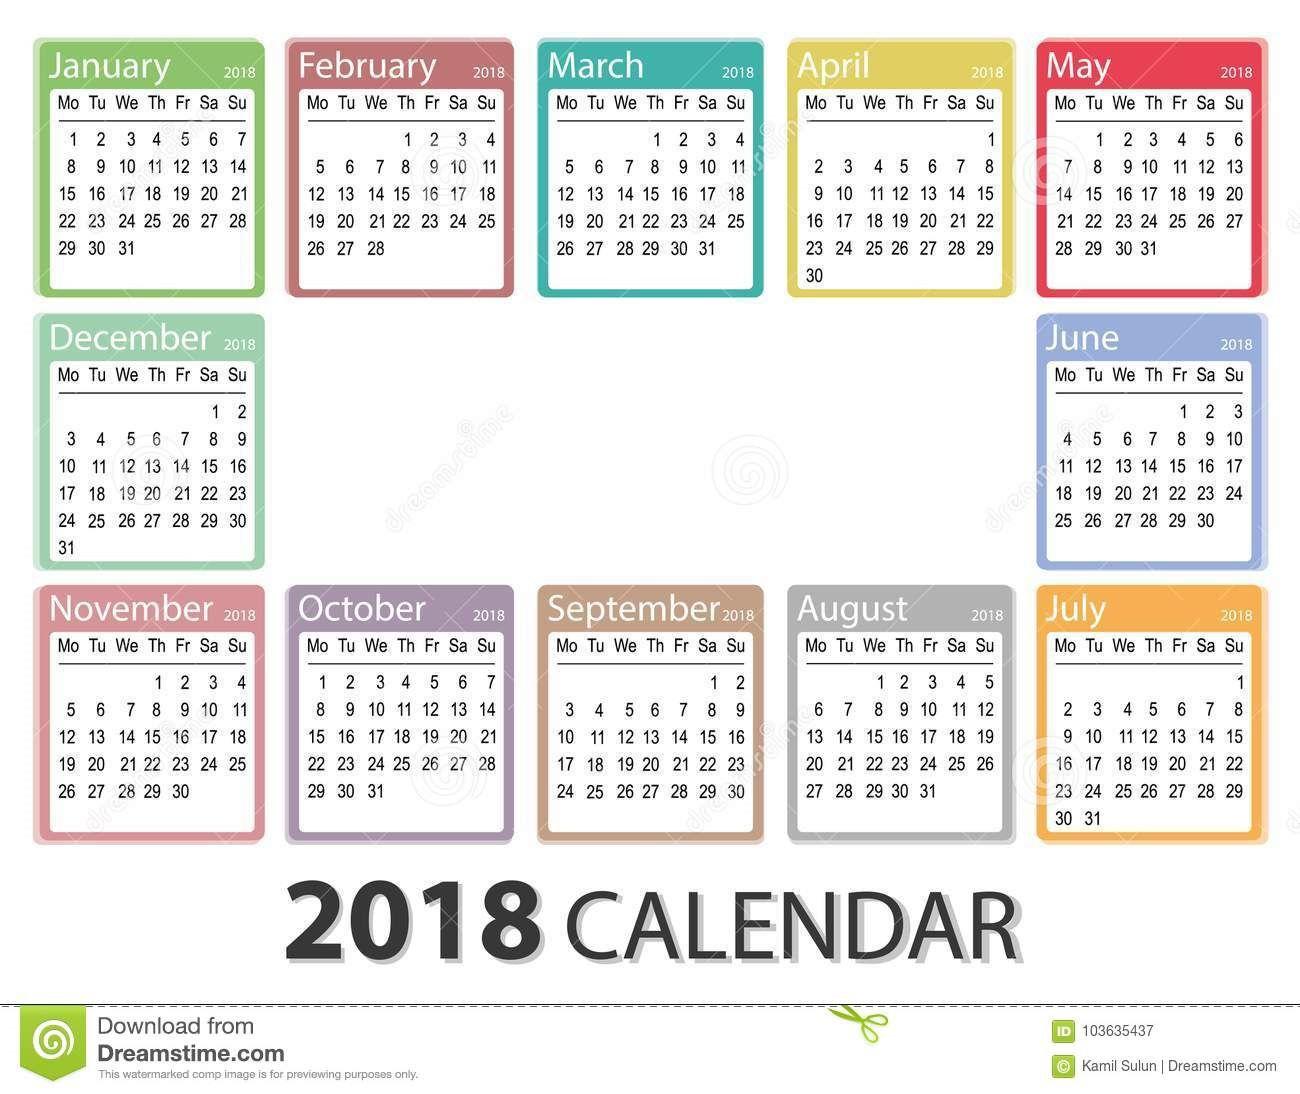 009 Incredible Free Printable Weekly Calendar Template 2018 High Resolution Full